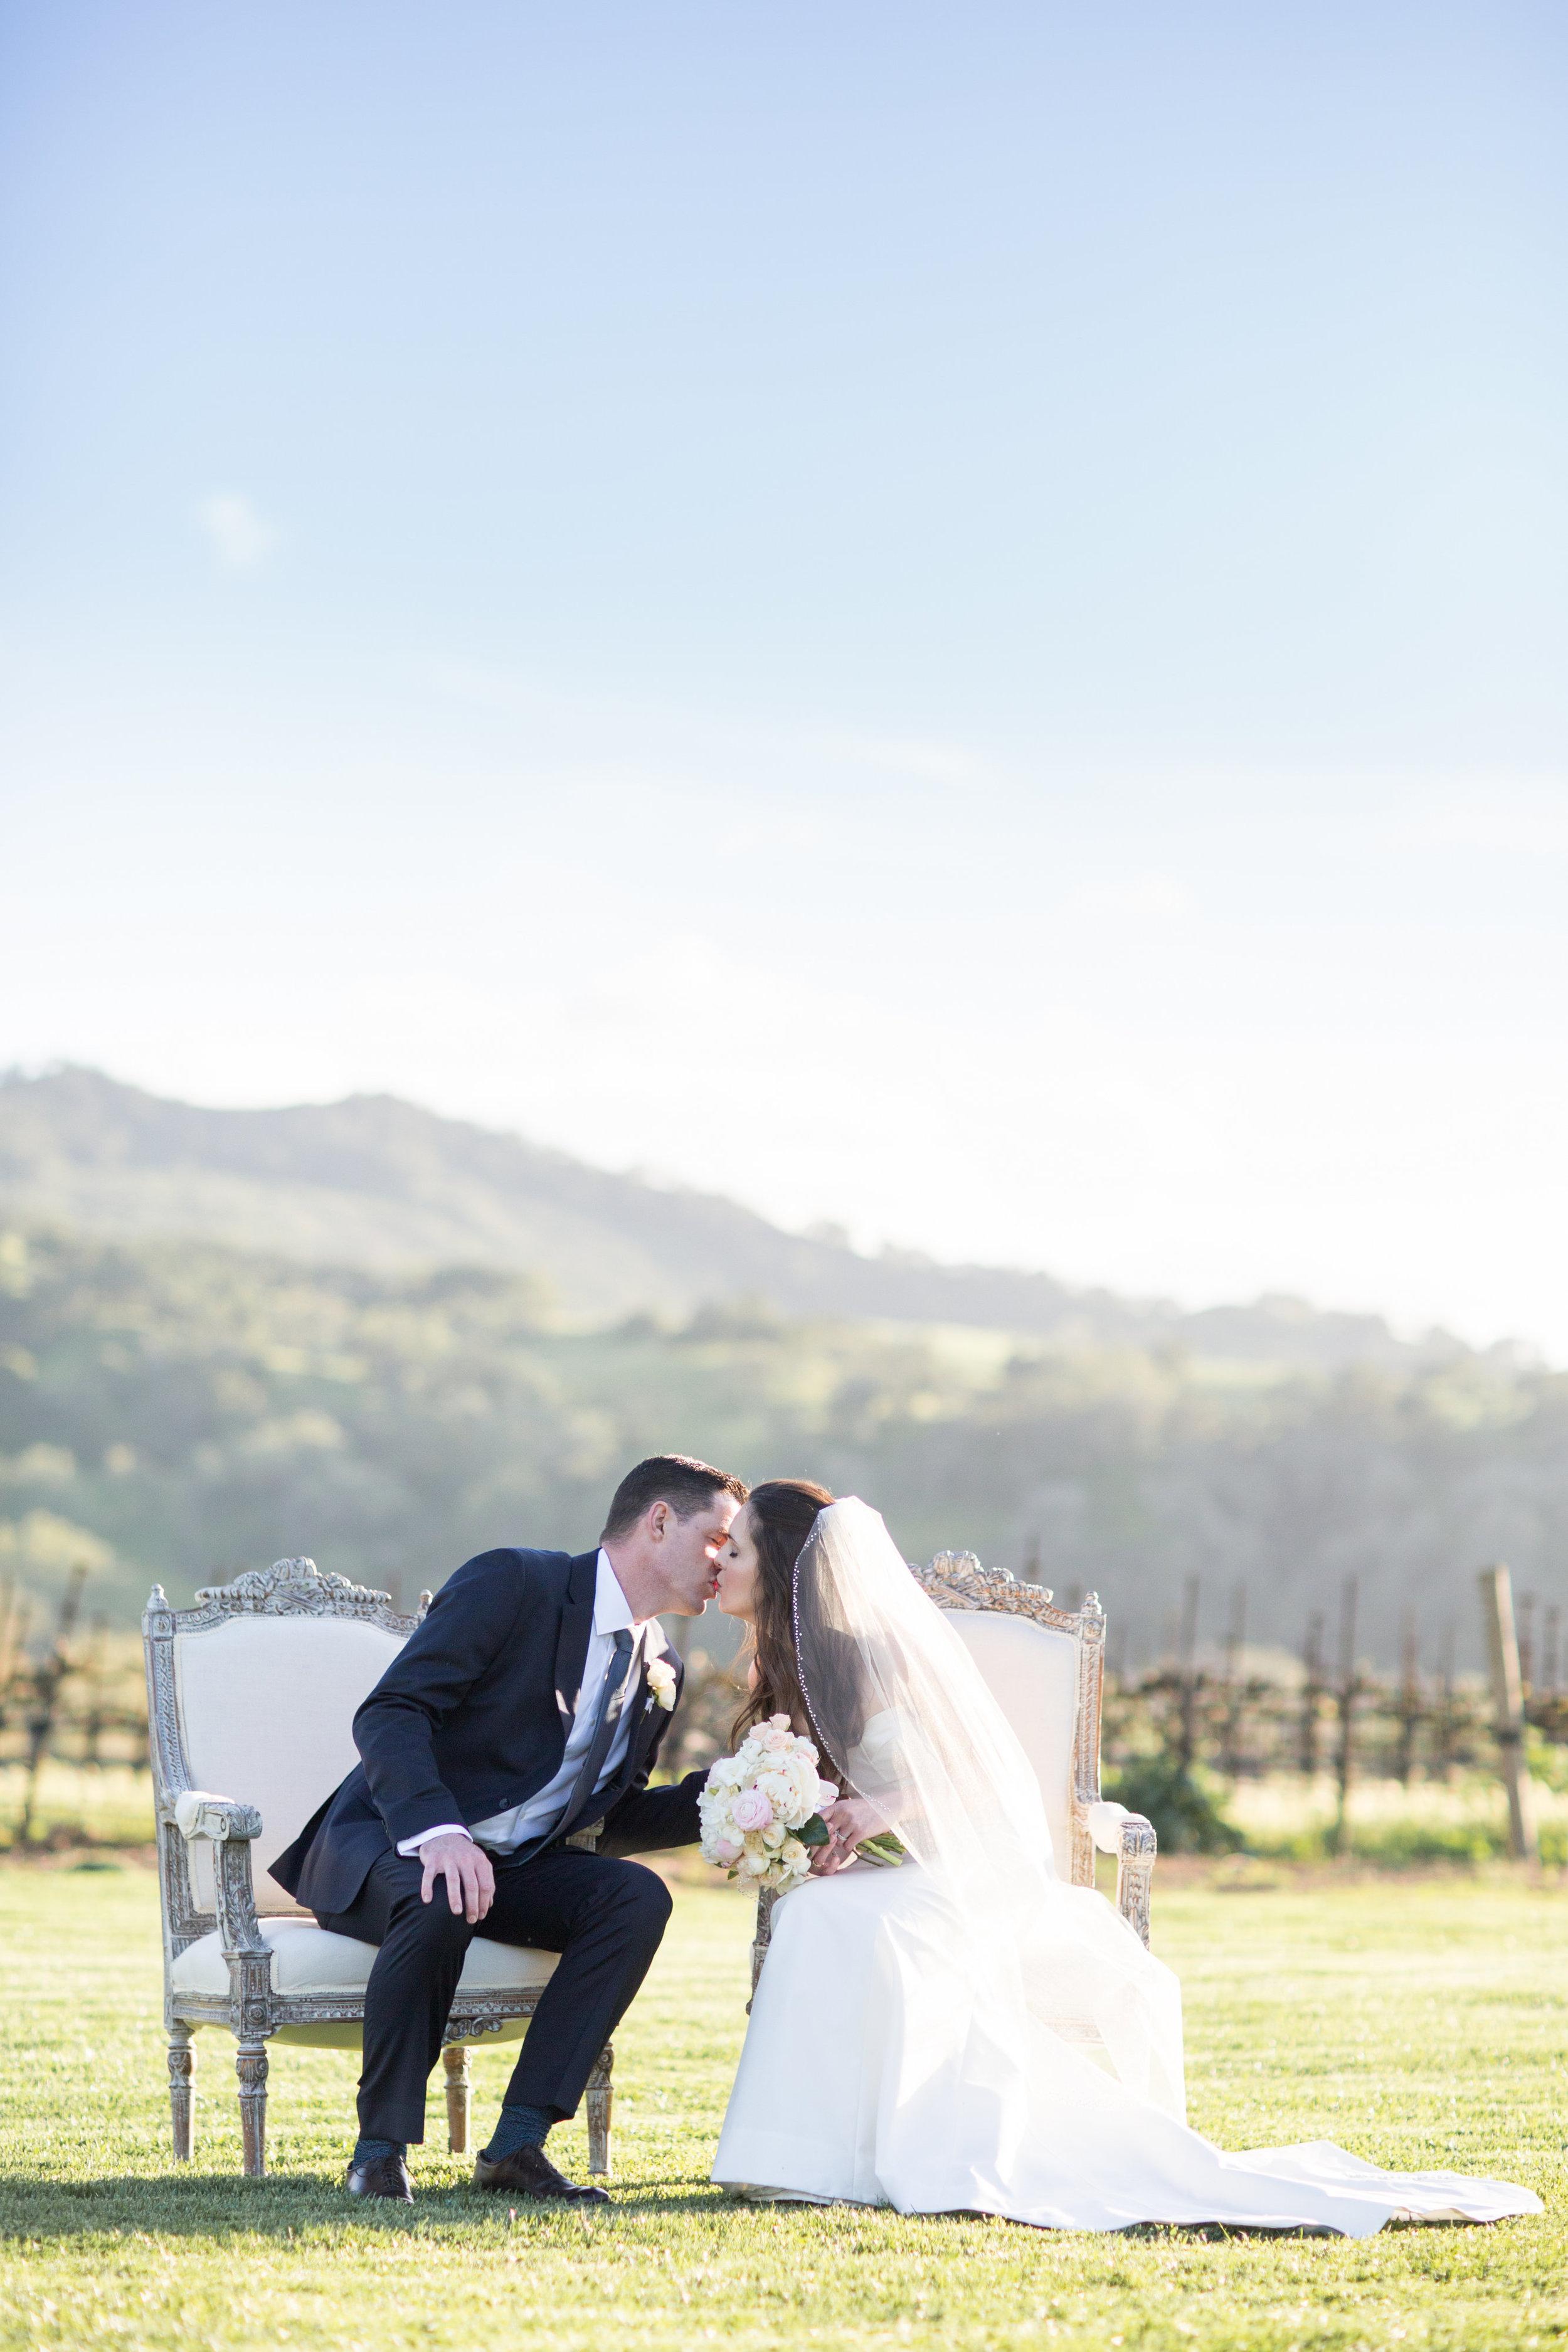 santa-barbara-elopement-wedding-planner-planning-coordinator-event-day-of-sunstone-winery-villa-tuscan-vineyard-gold-classic-elope (7).jpg